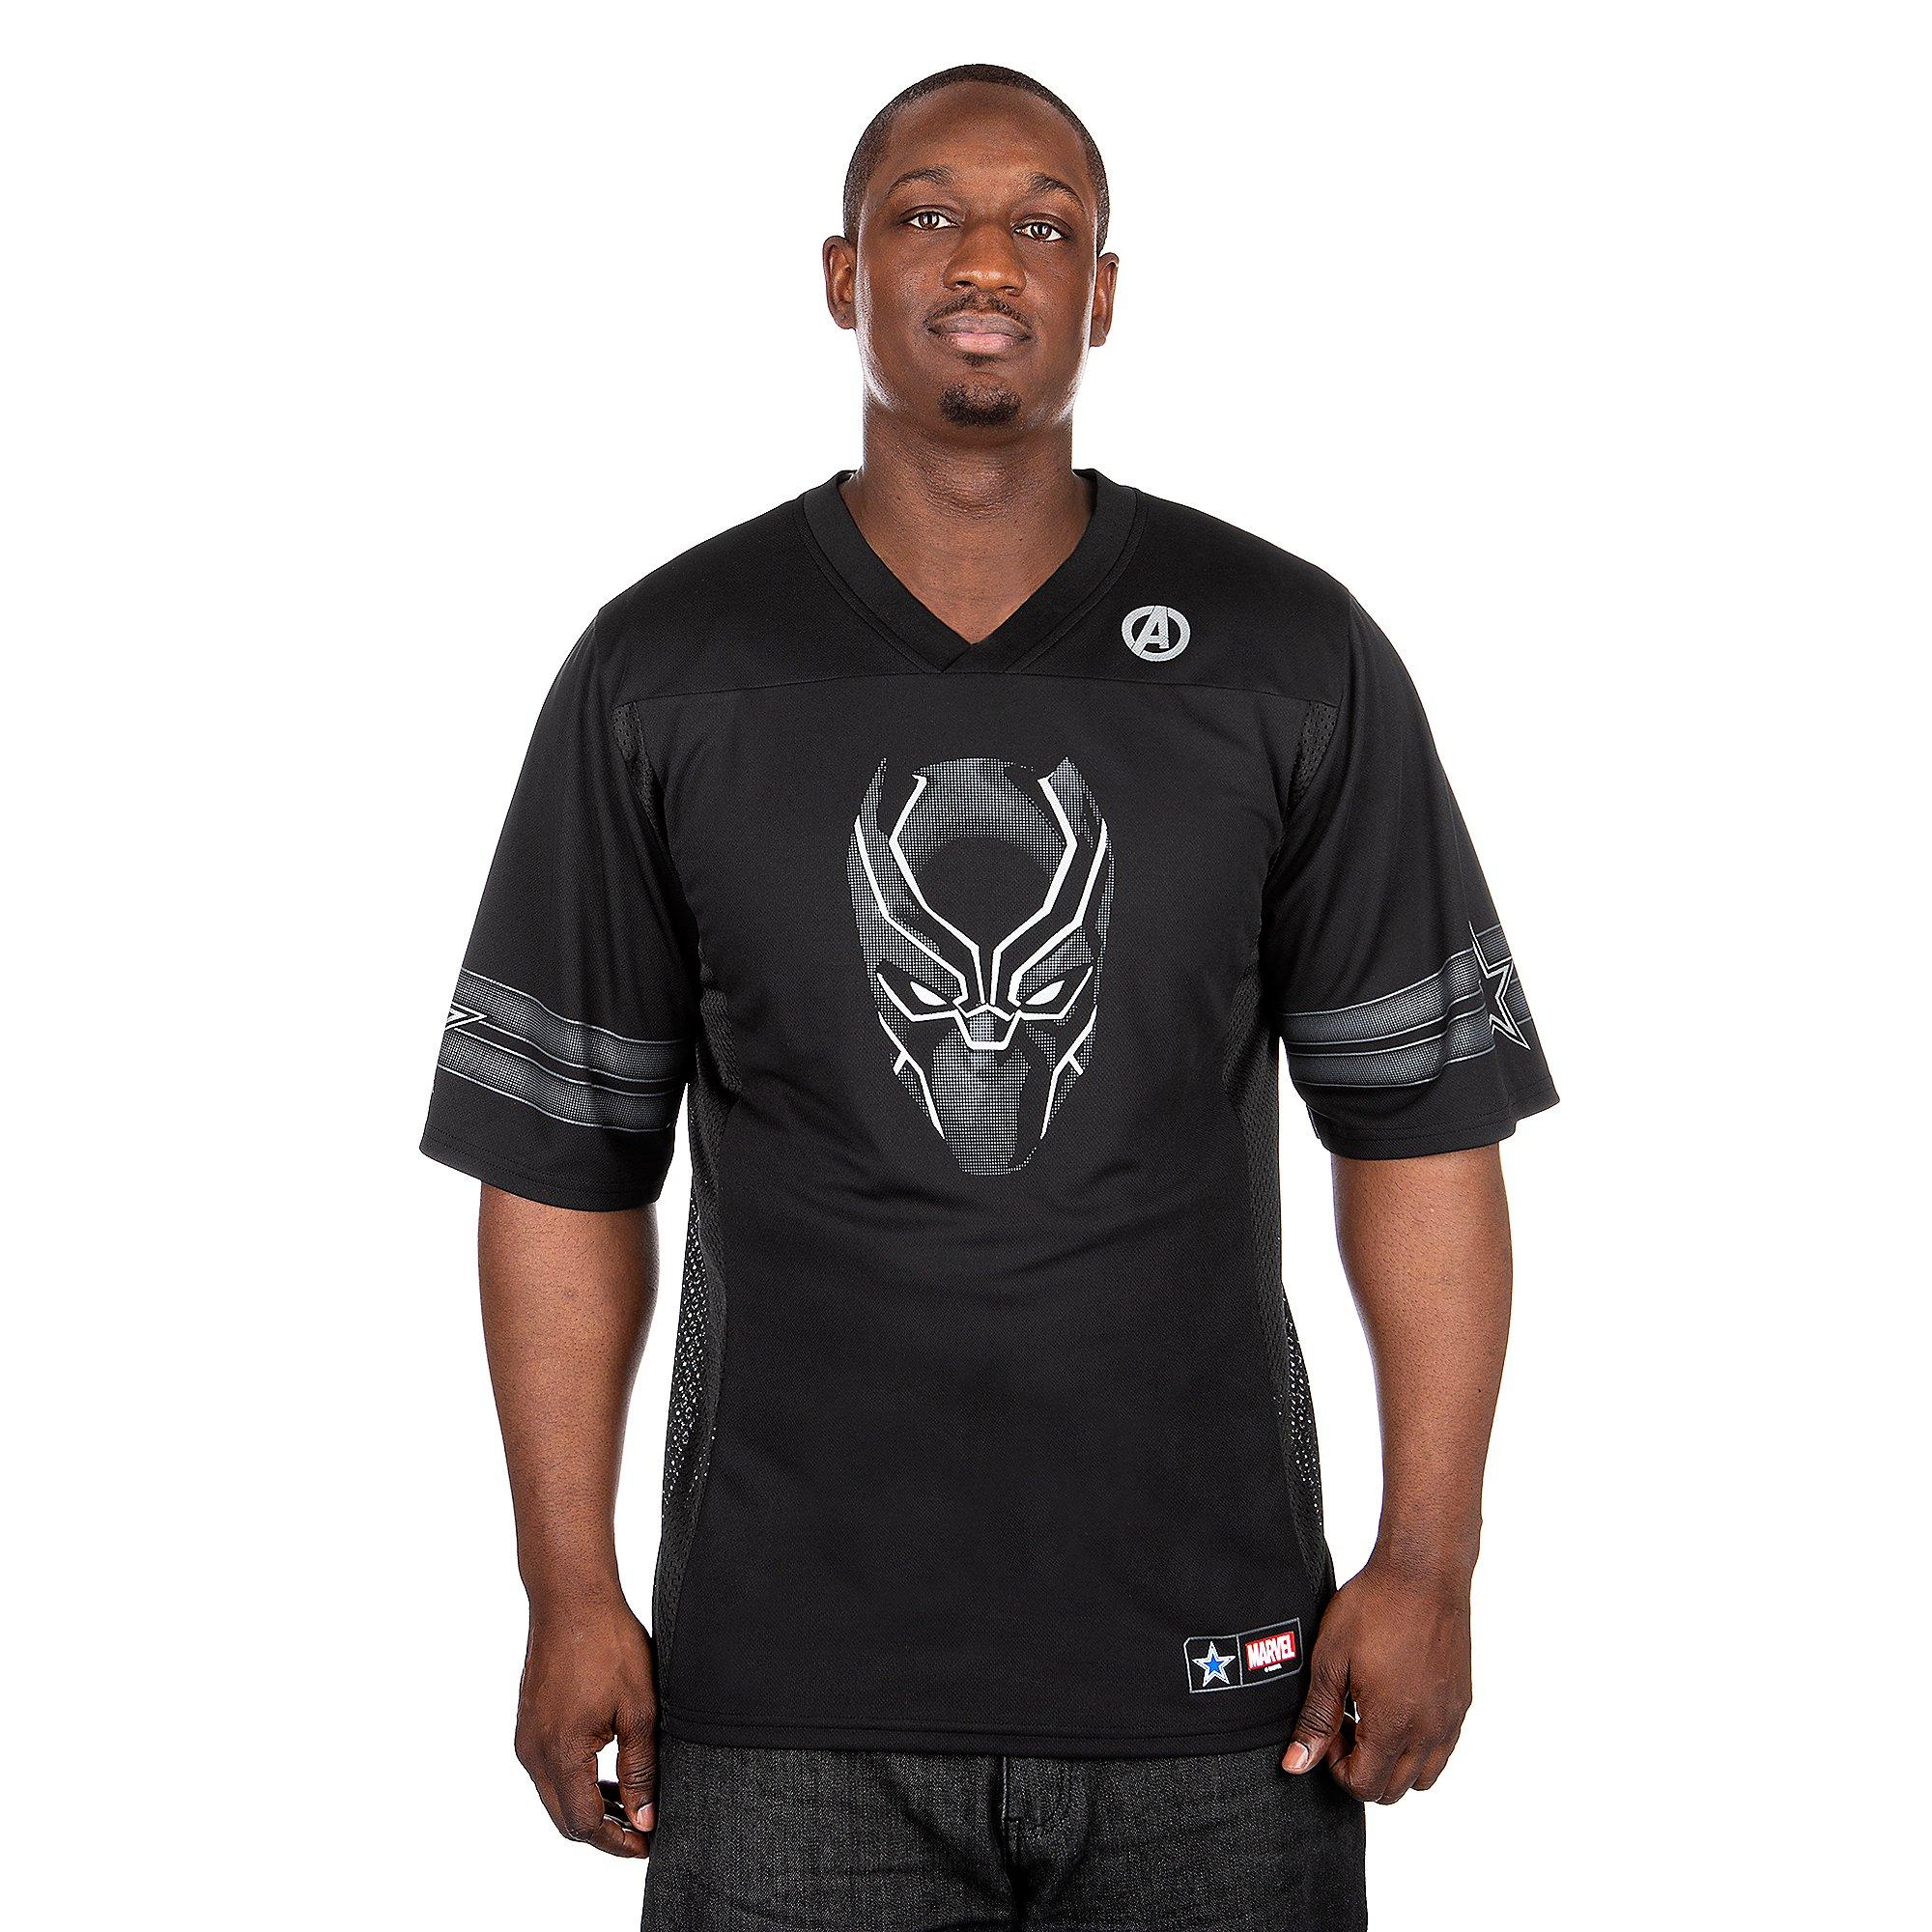 Dallas Cowboys MARVEL Black Panther Jersey | Dallas Cowboys Pro Shop